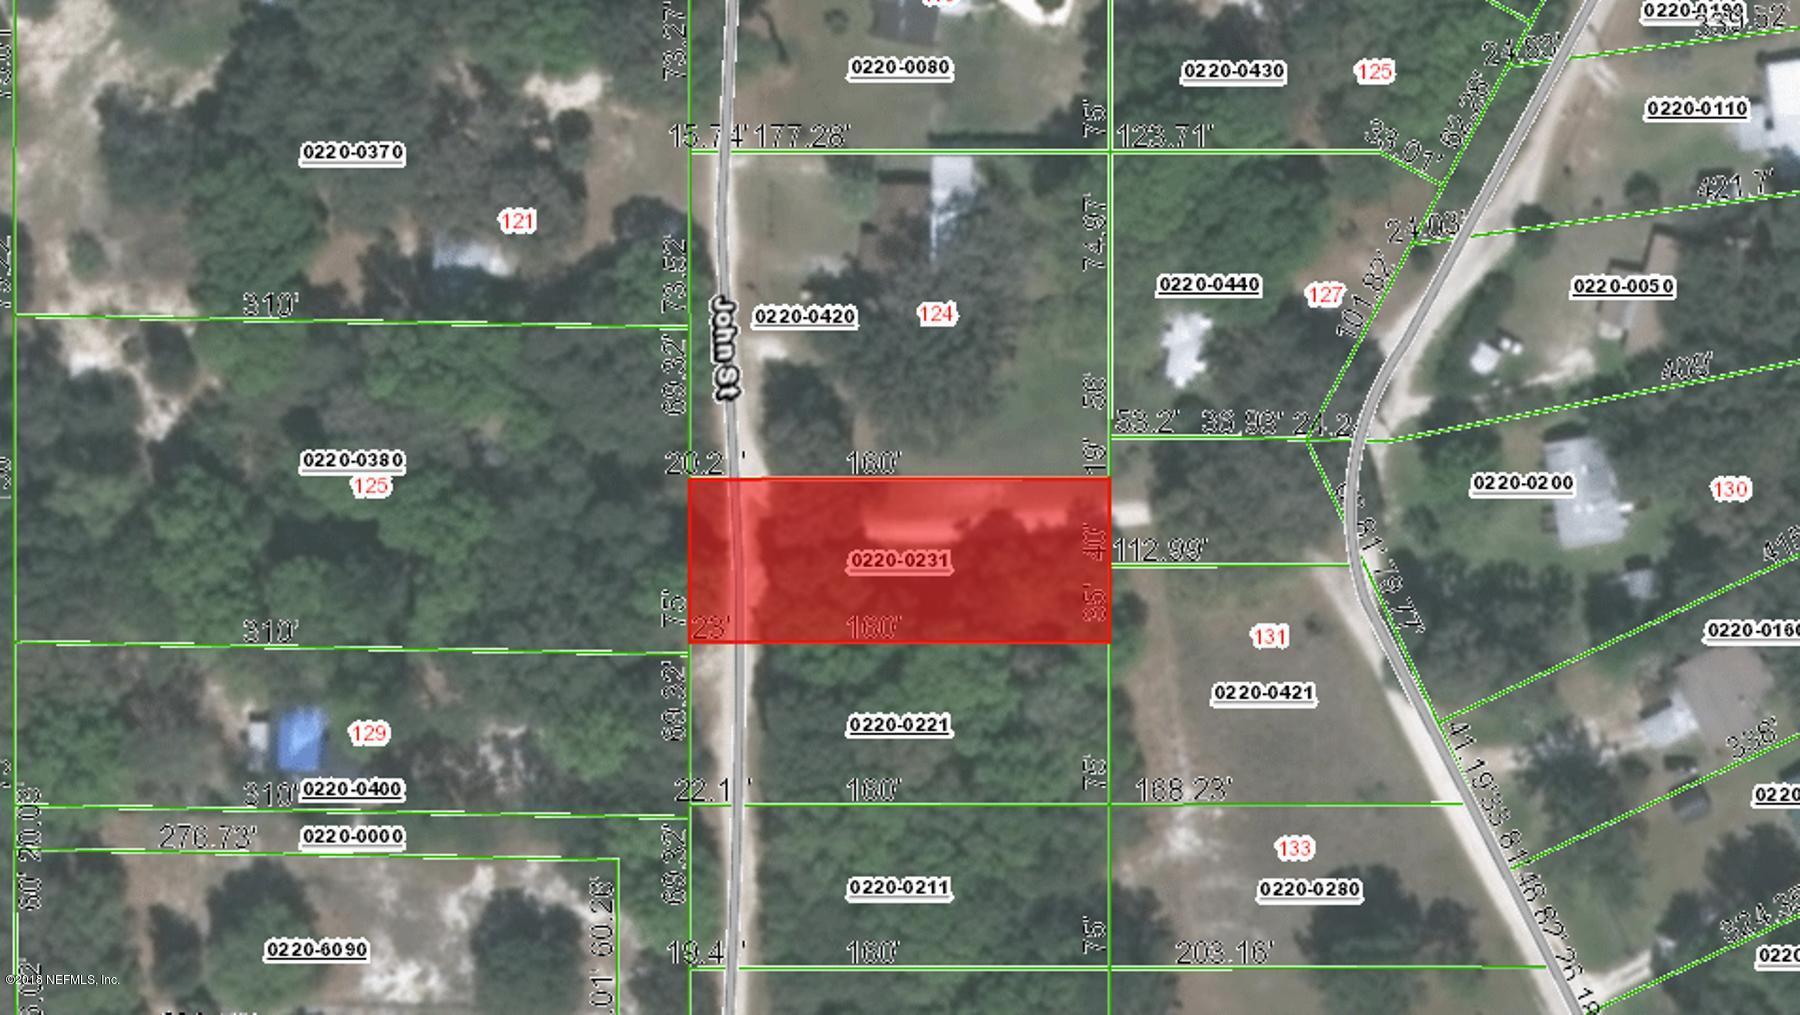 000 JOHN, HAWTHORNE, FLORIDA 32640, ,Vacant land,For sale,JOHN,936569